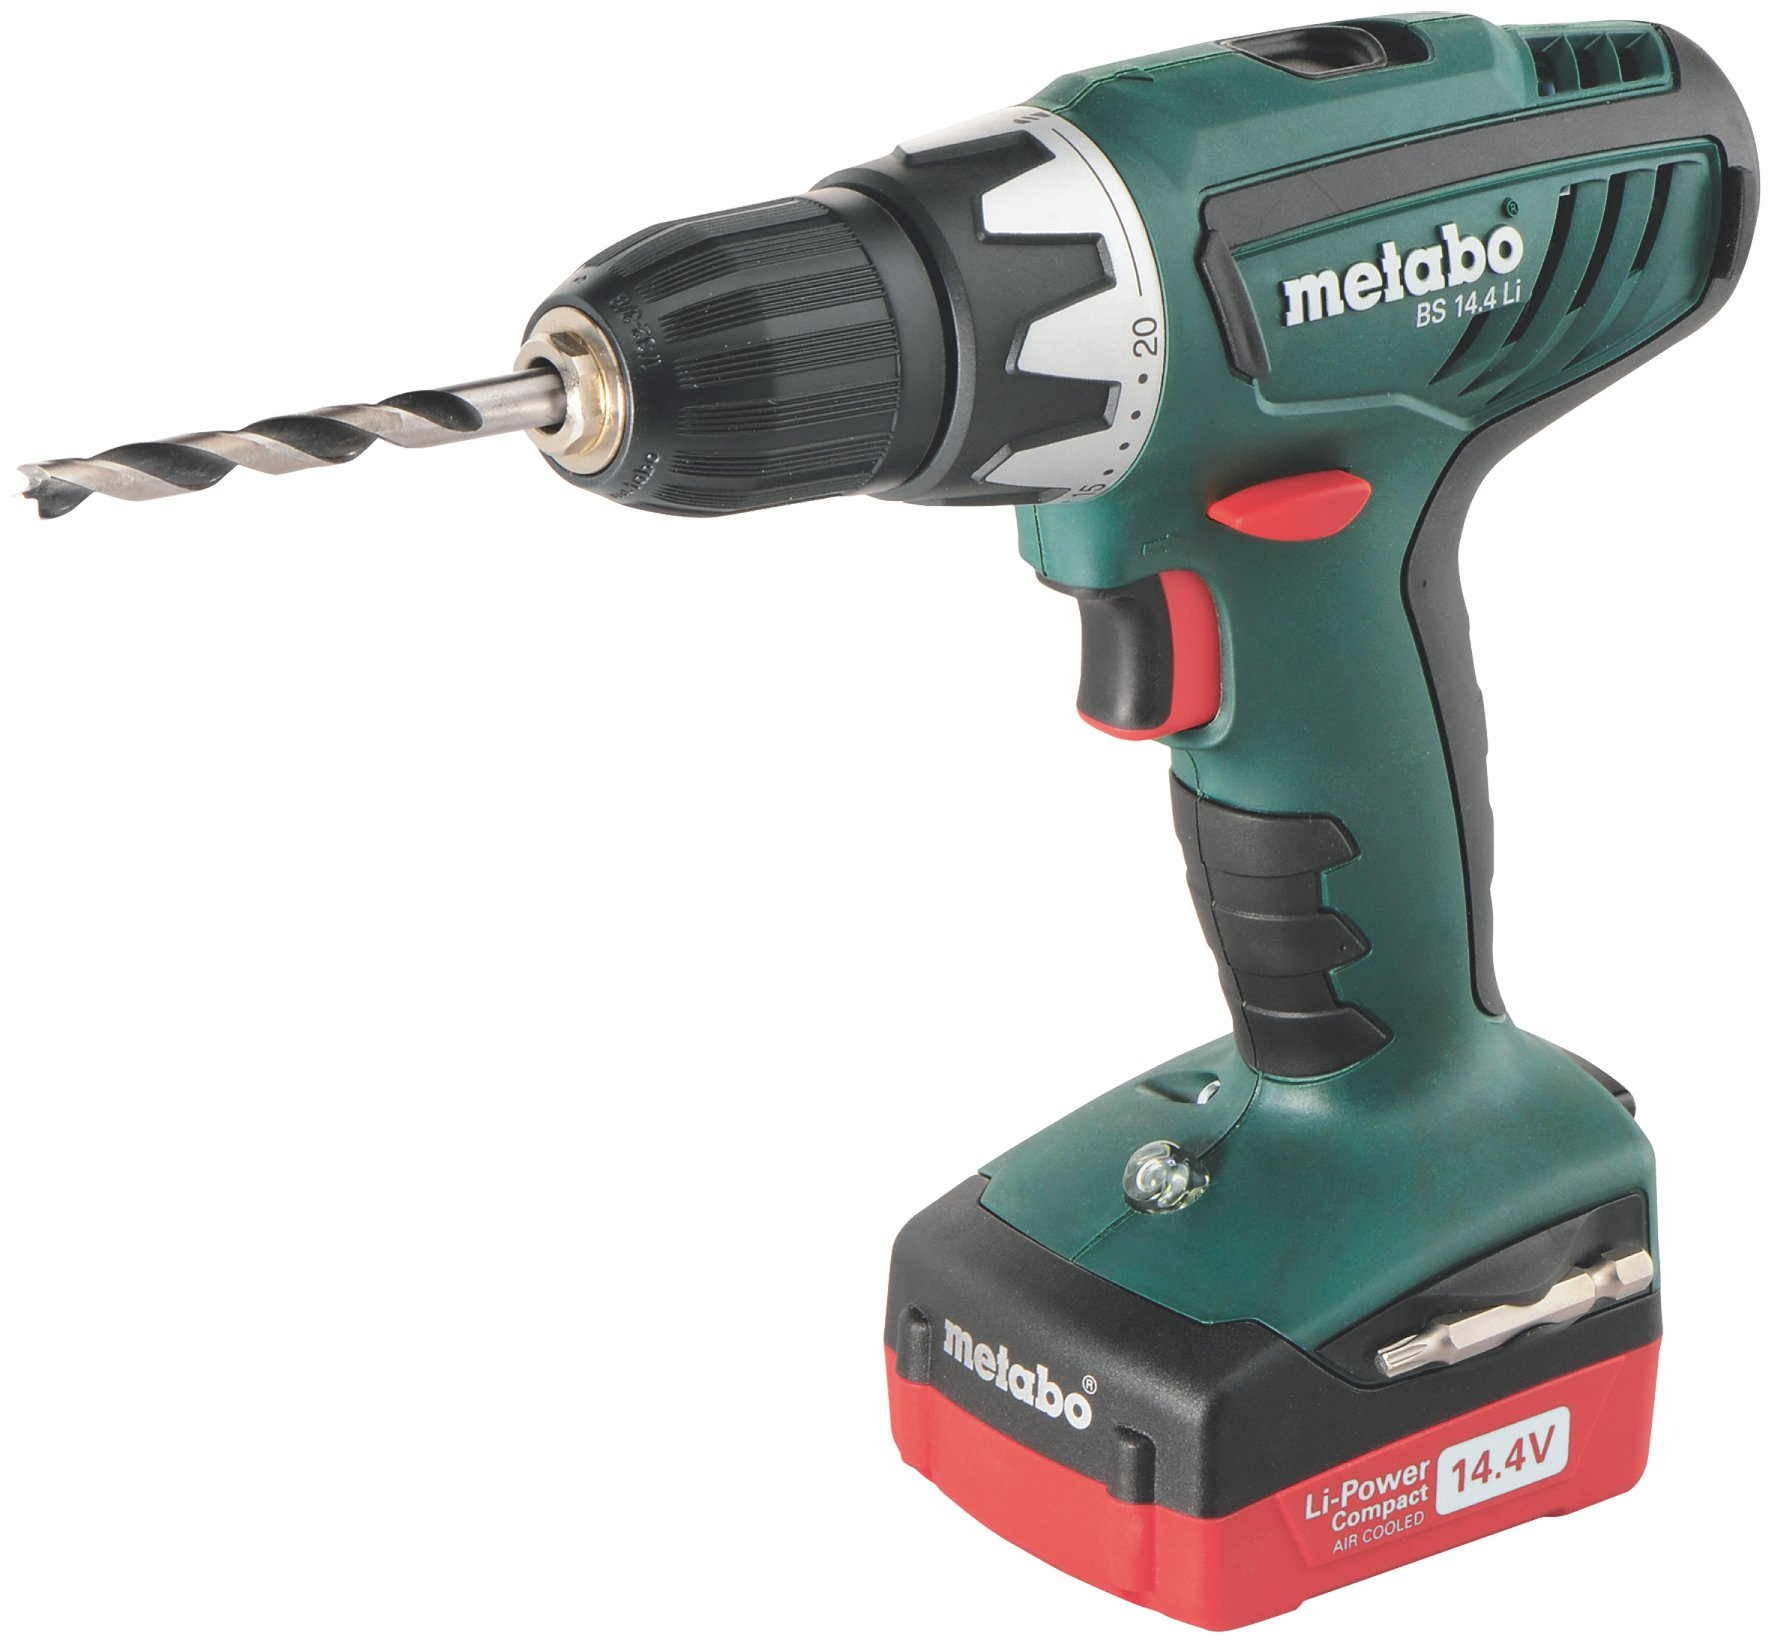 Metabo-602105510-BS-144-Li-Elektrowerkzeuge-144-V-Schwarz-Grn